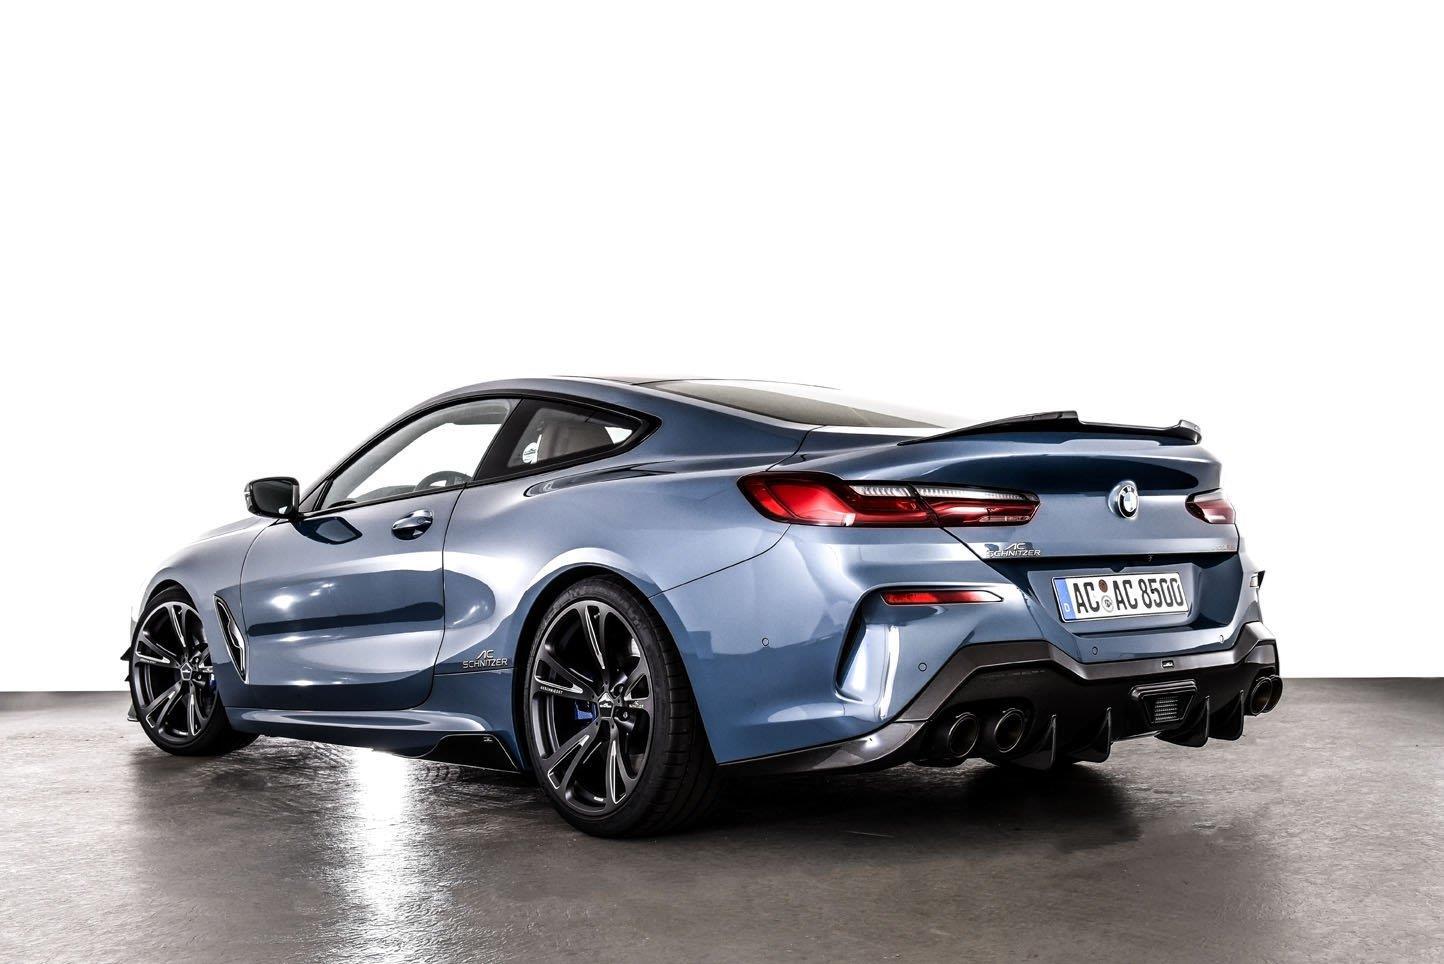 BMW 8-Series tang cong suat, 'lot xac' voi ban do moi hinh anh 5